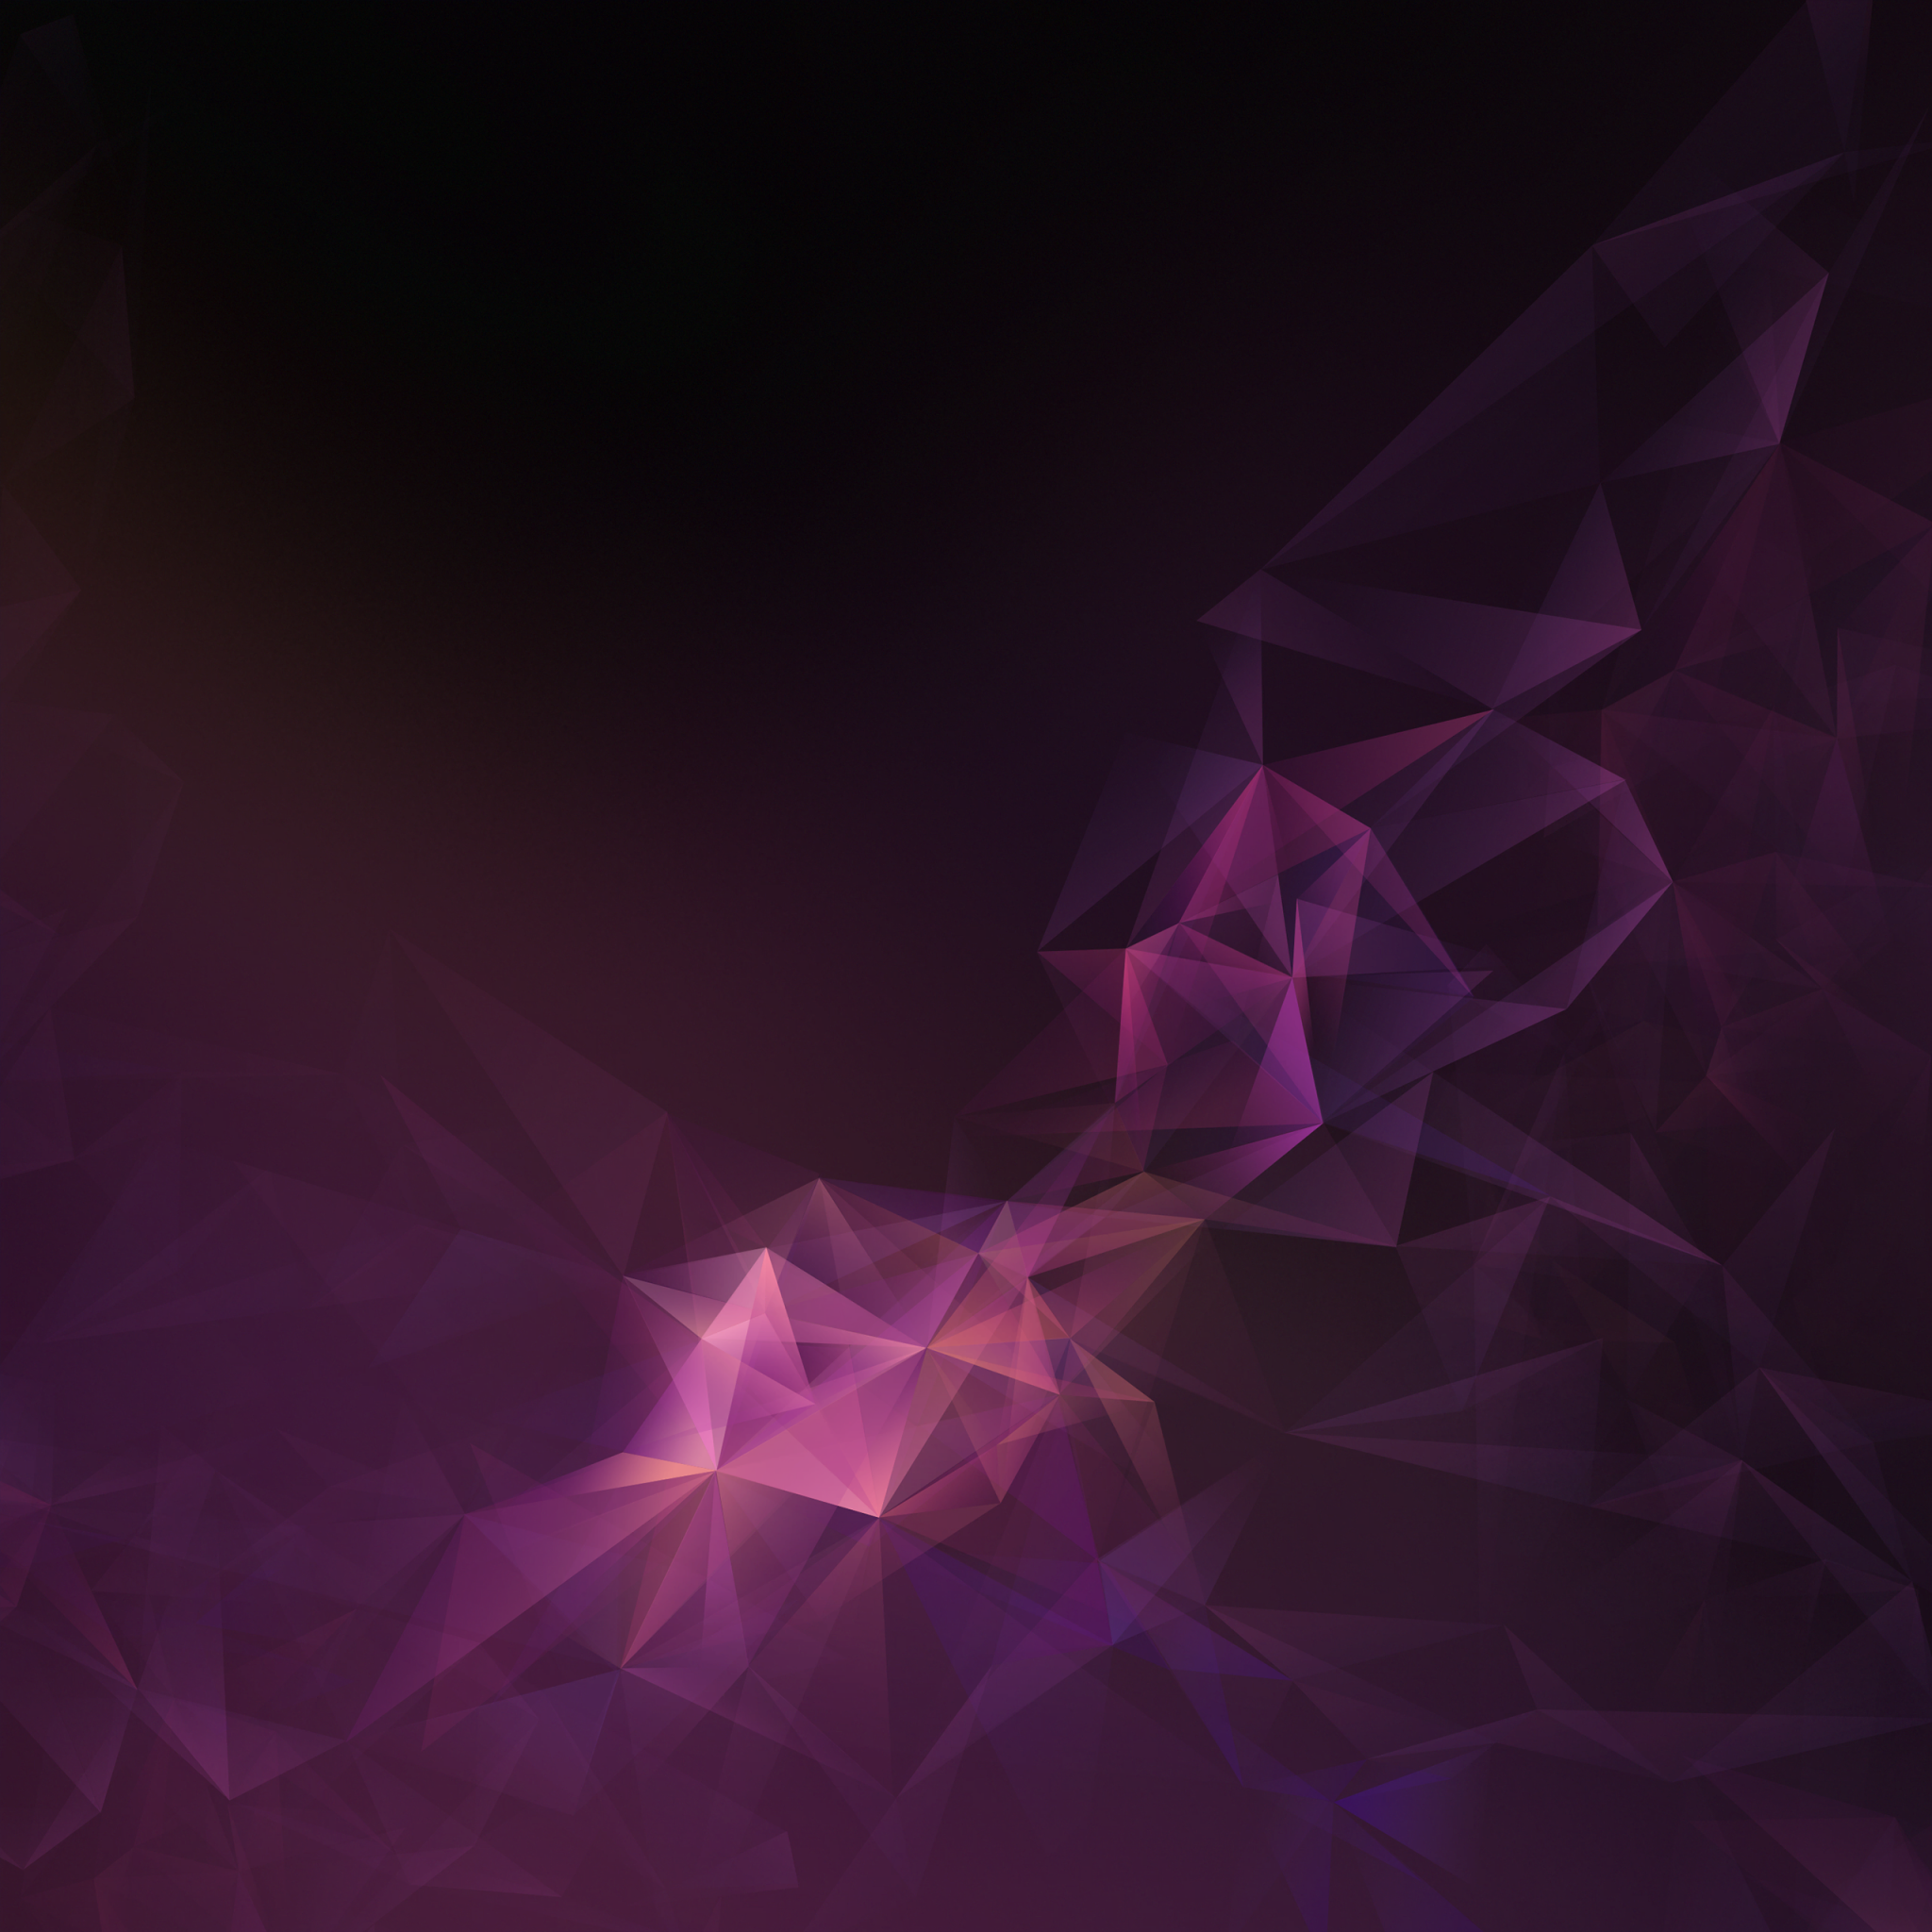 Must see Wallpaper Home Screen Xperia - Galaxy-s9-wallpaper-3-techfoogle  HD_449824.png?w\u003d300